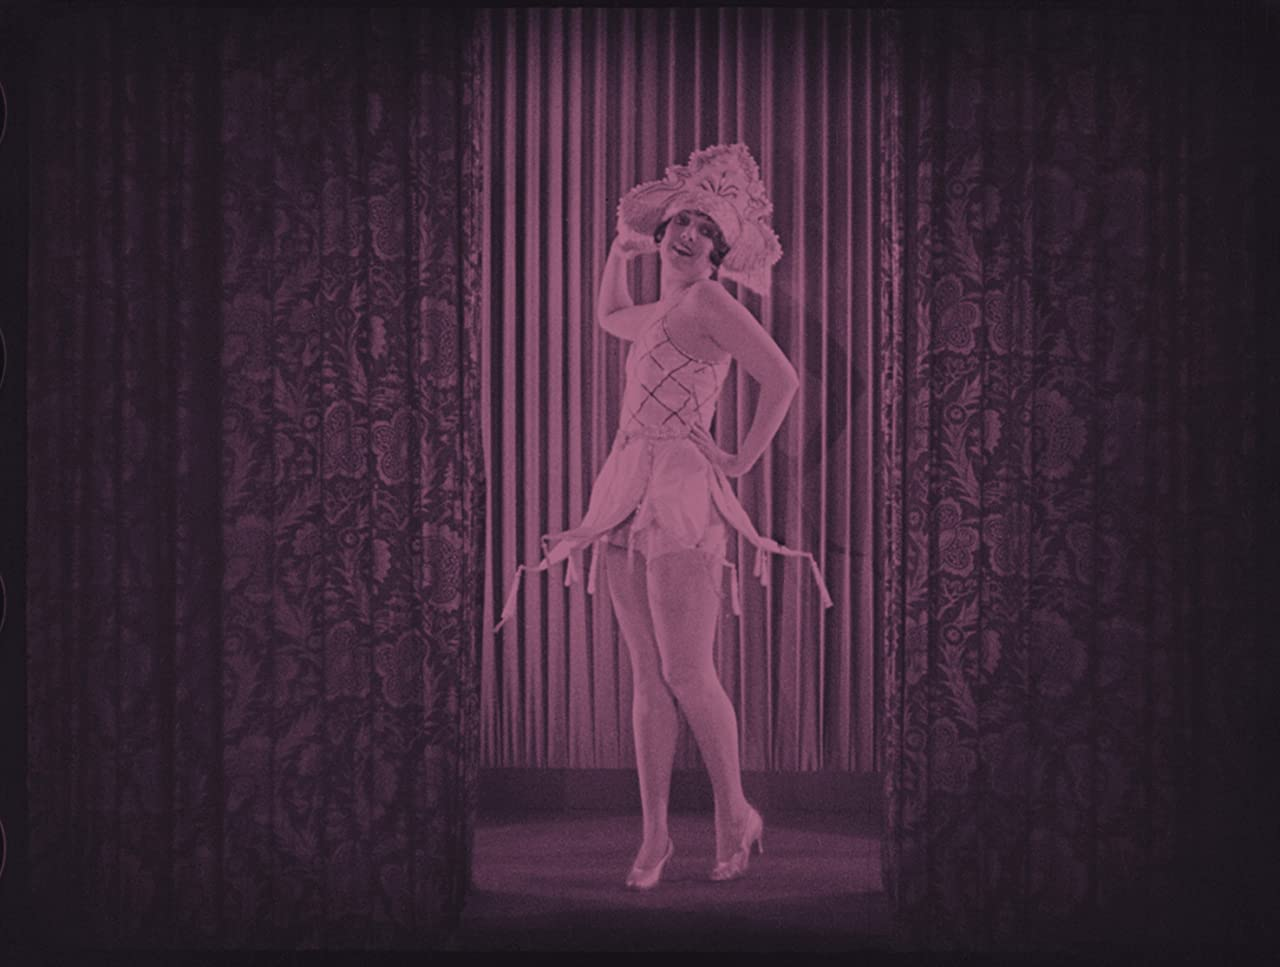 Carmelita Geraghty in The Pleasure Garden (1925)